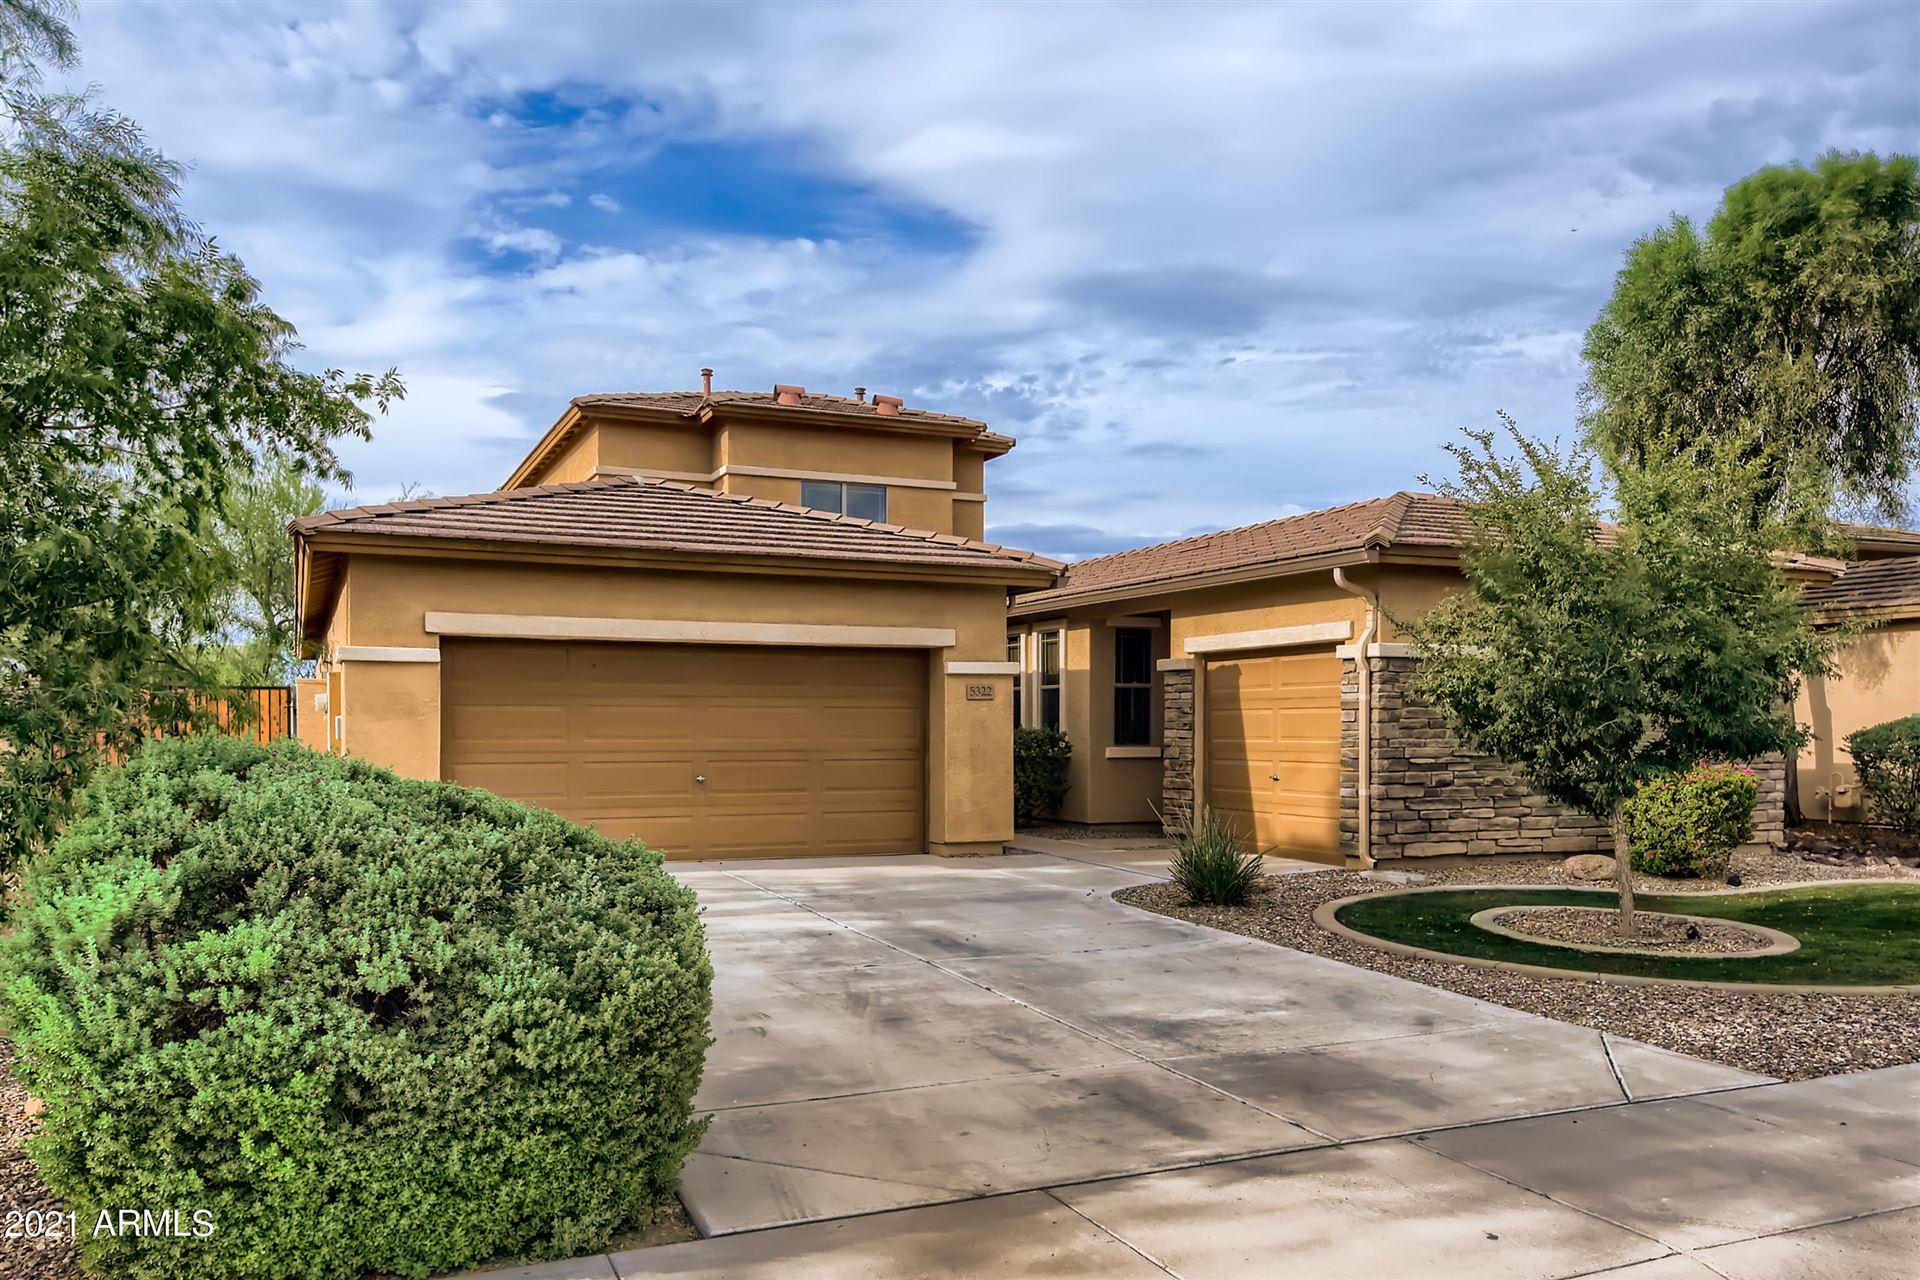 Photo of 5322 W COLES Road, Laveen, AZ 85339 (MLS # 6270828)